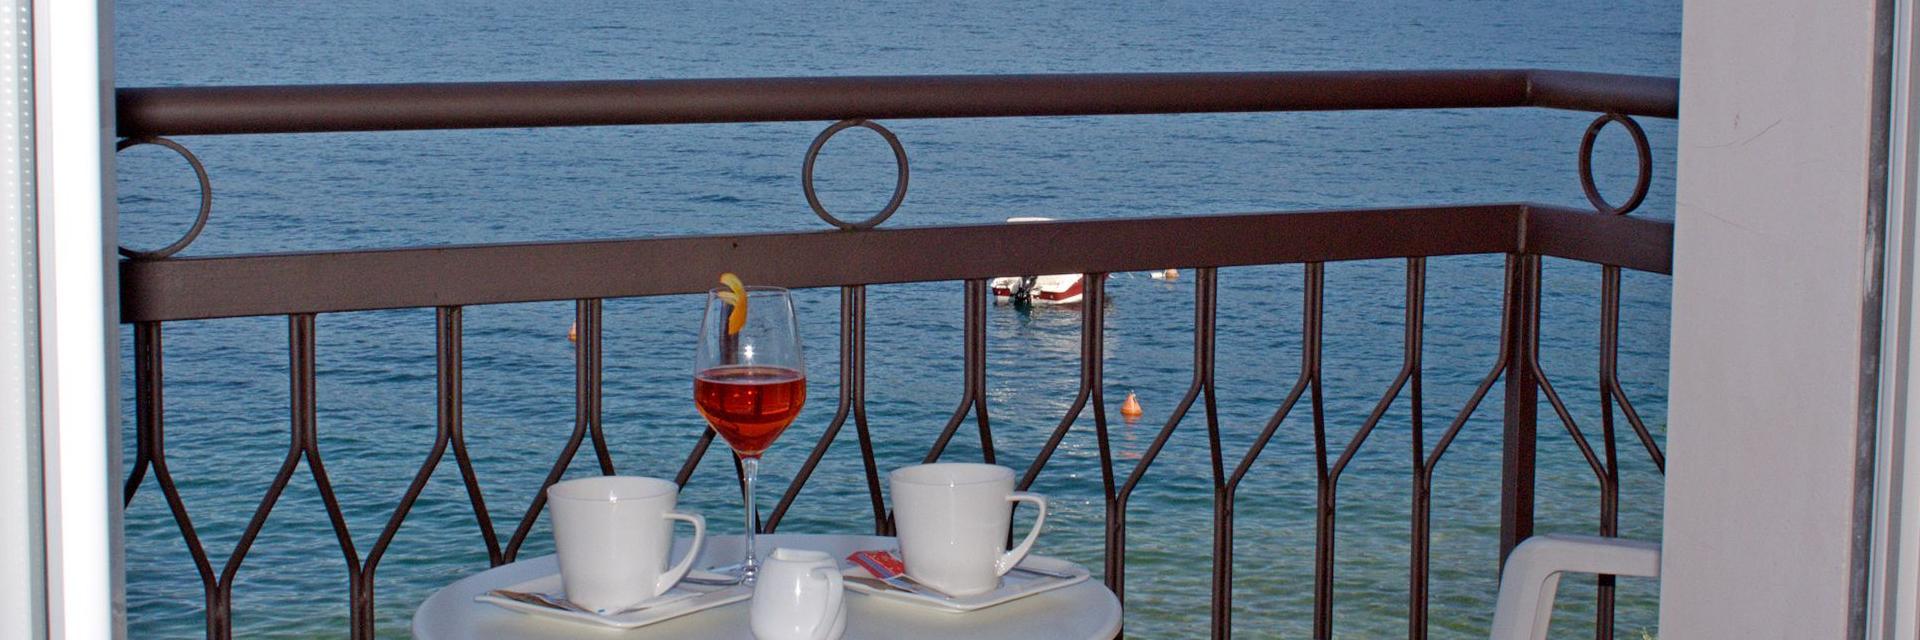 hotel-ristorante-menapace-torri-del-benaco-04.jpg